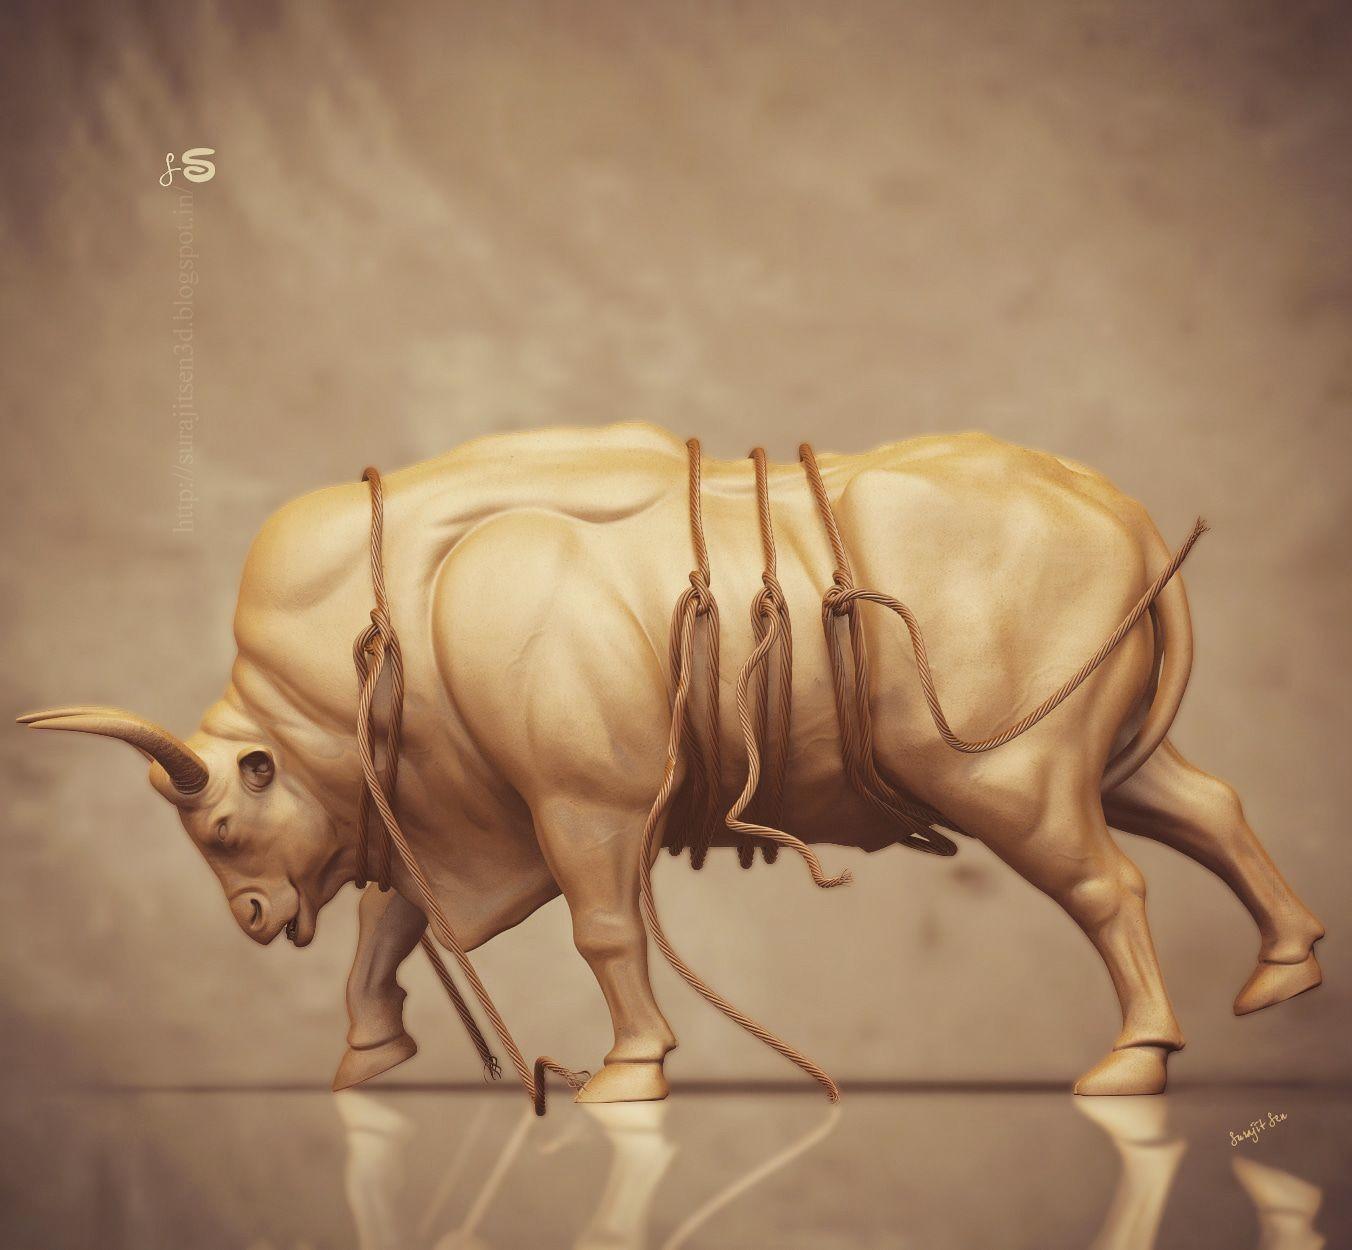 Surajit sen angry gaur bull surajitsen reshare 10062018 ints